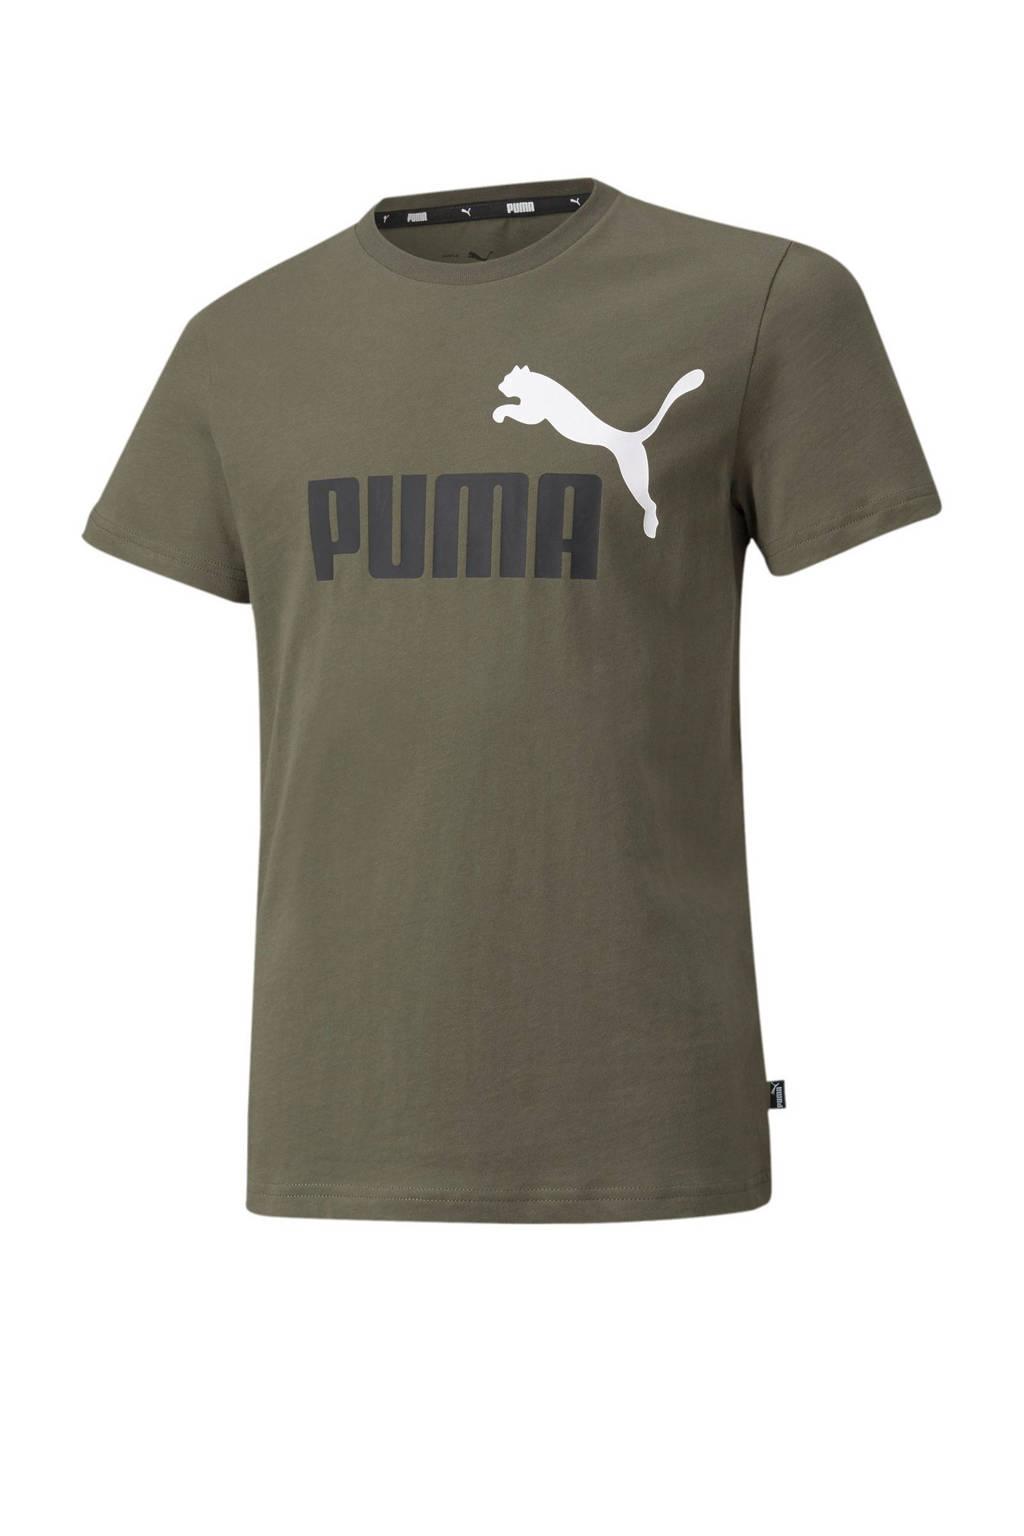 Puma T-shirt donkergroen, Donkergroen